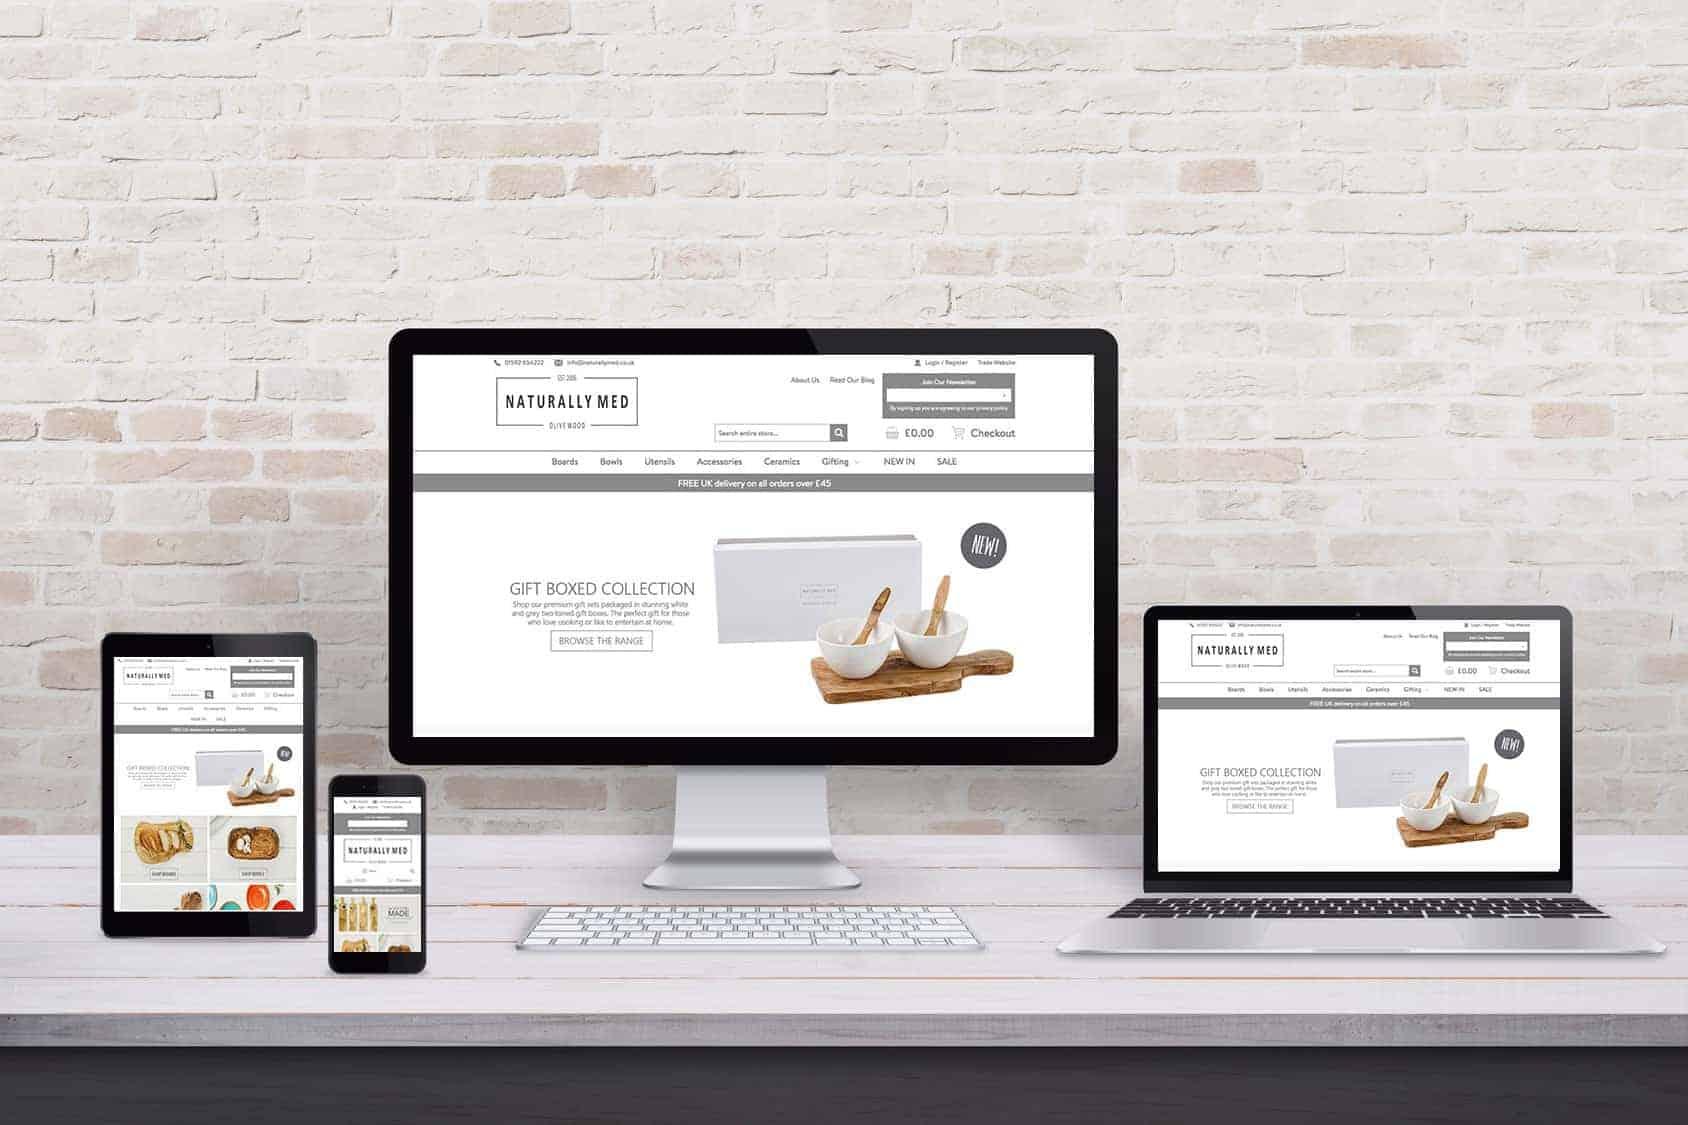 Naturally Med website design in Glasgow